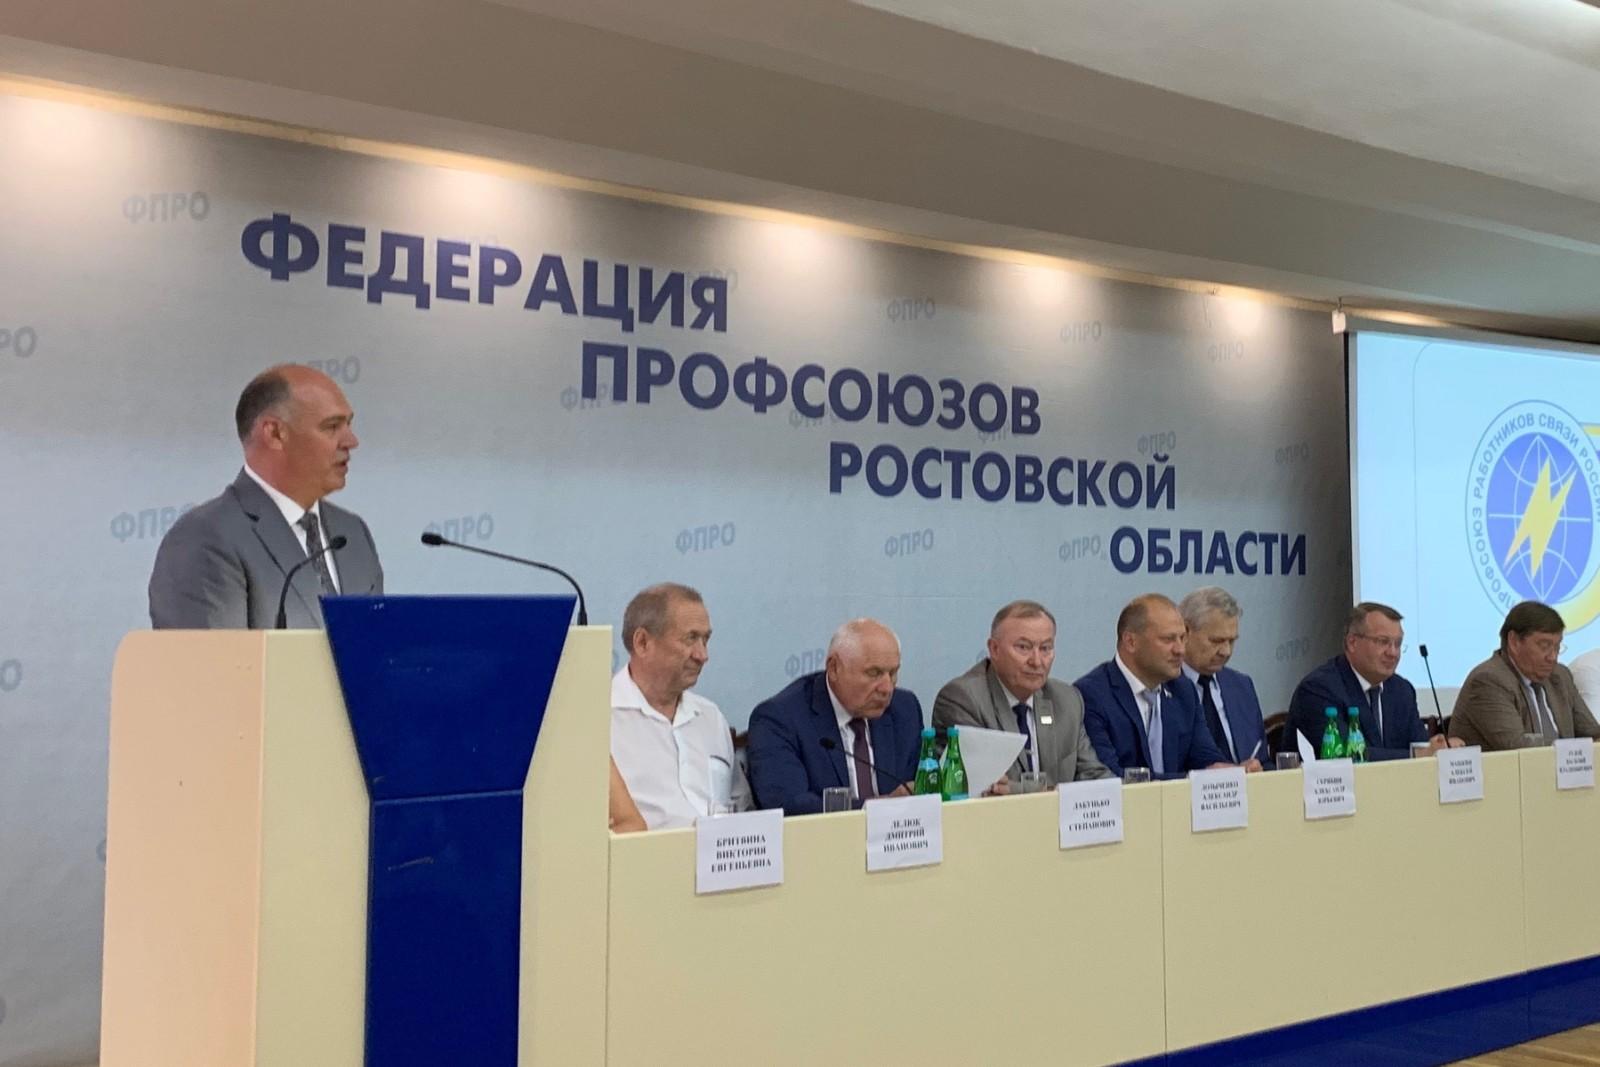 Председателем профсоюза работников связи Дона в четвертый раз избран Алексей Машкин